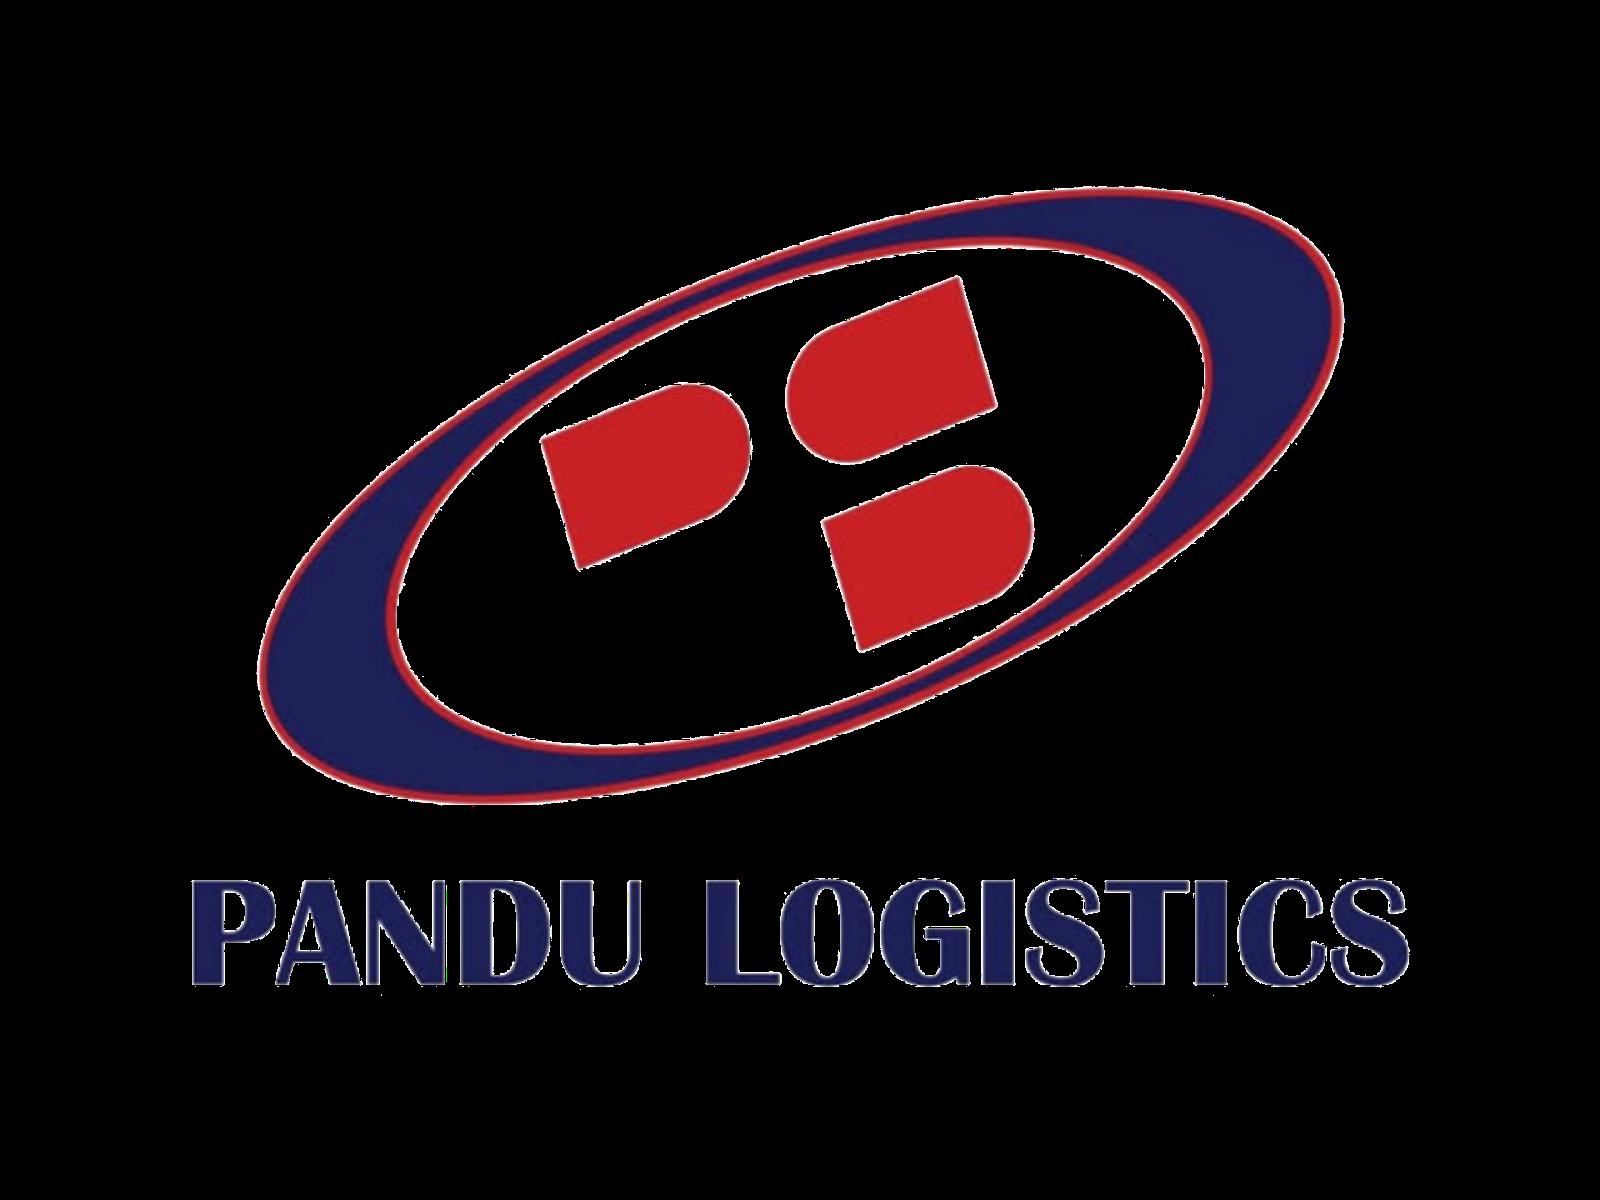 Logo Pandu Logistics Format PNG